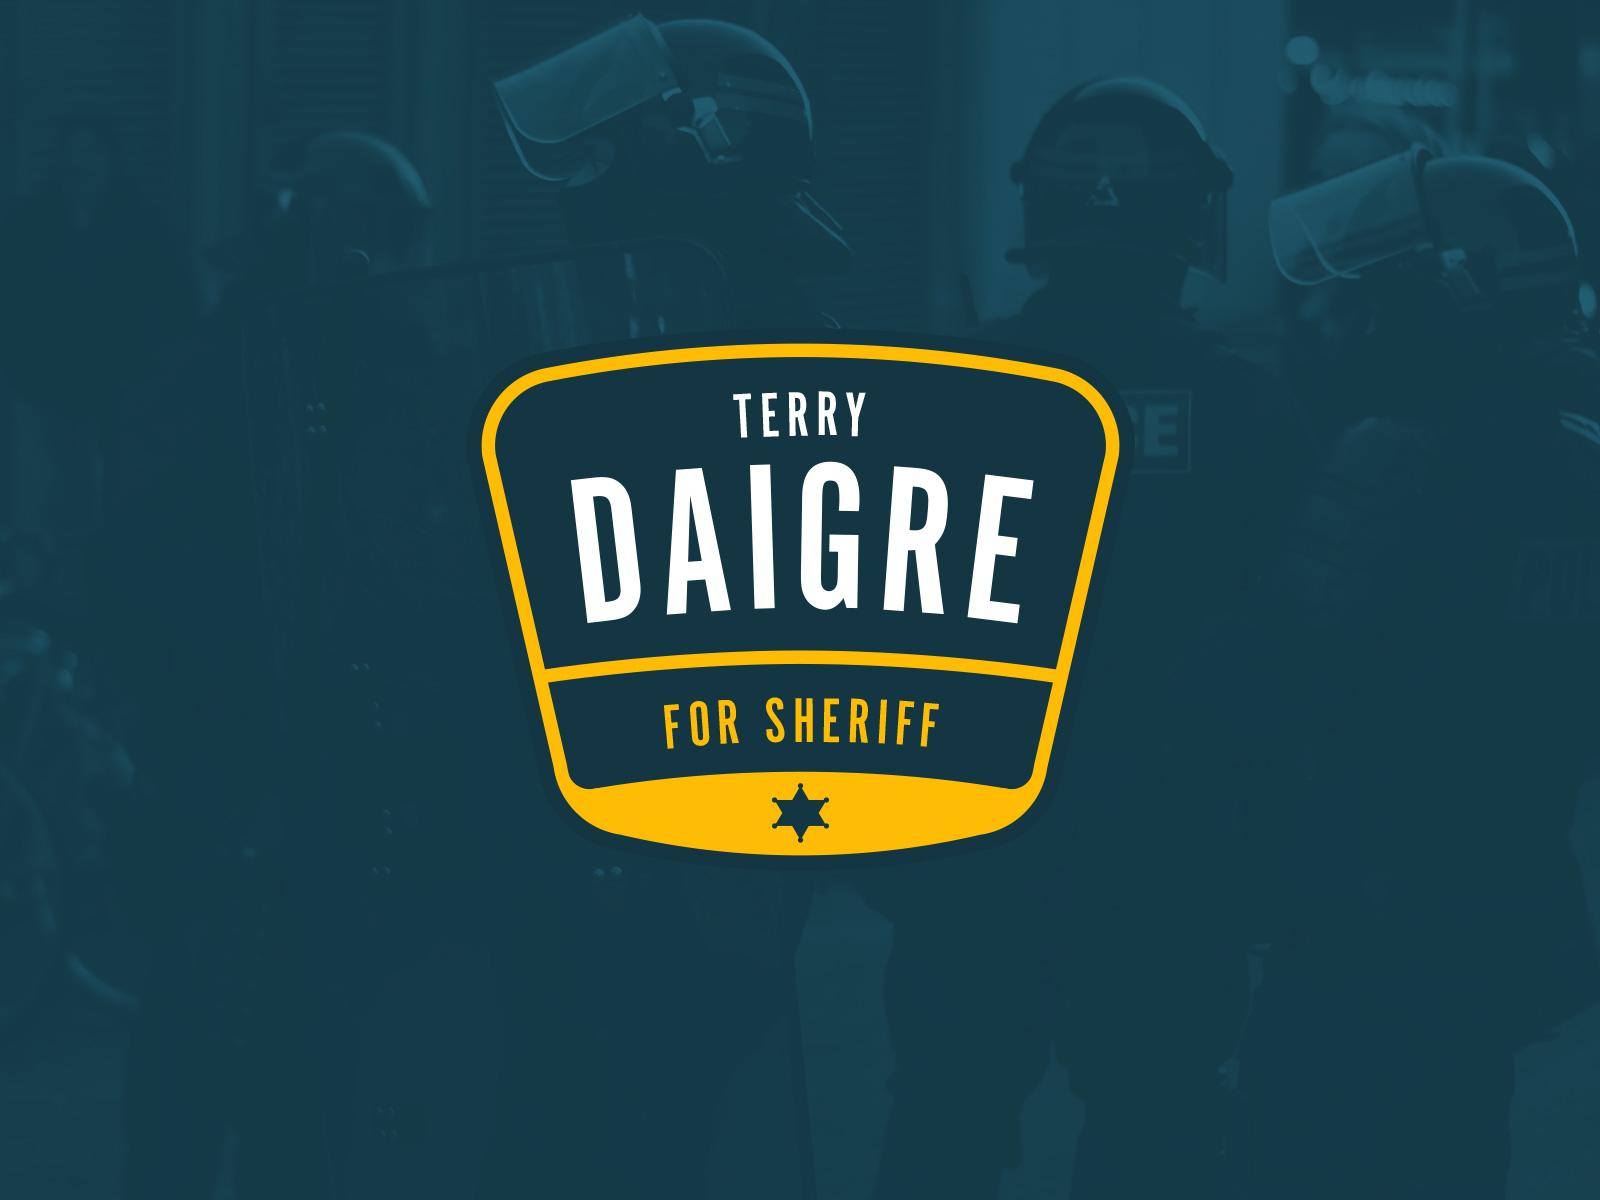 2019 04 03 daigre sheriff